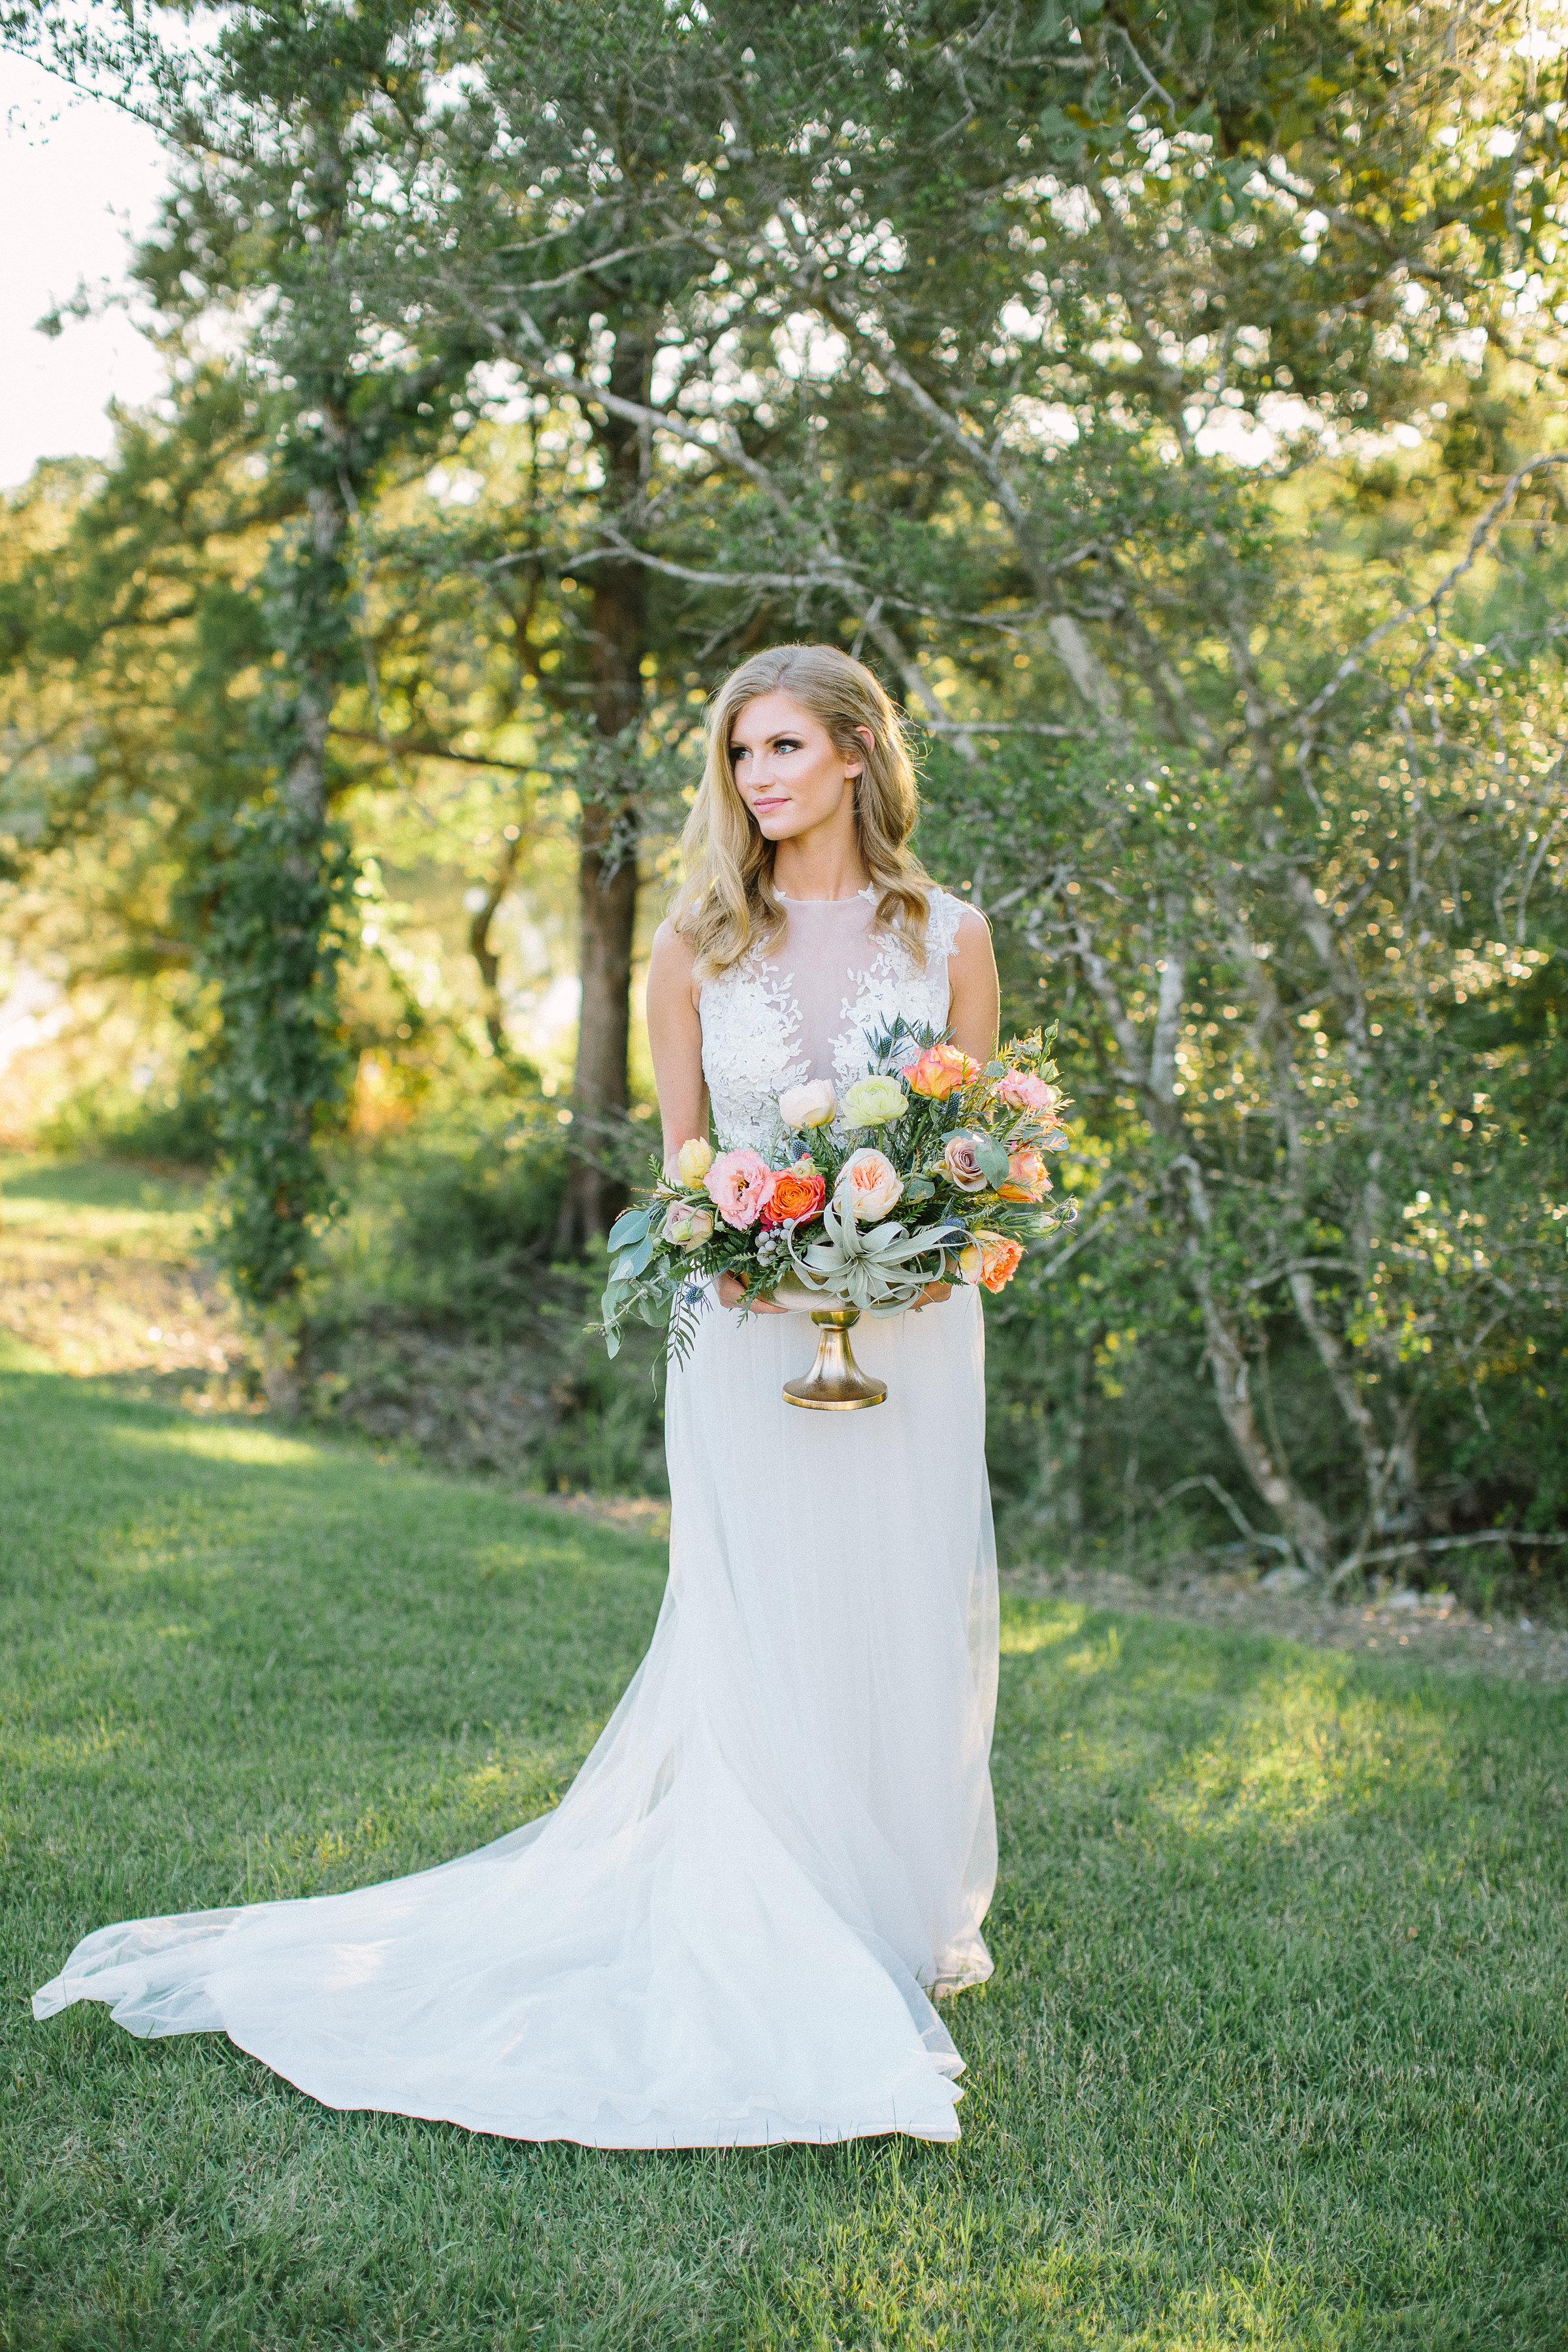 Ellen-Ashton-Photography-Peach-Creek-Ranch-Weddings-Wed-and-Prosper263